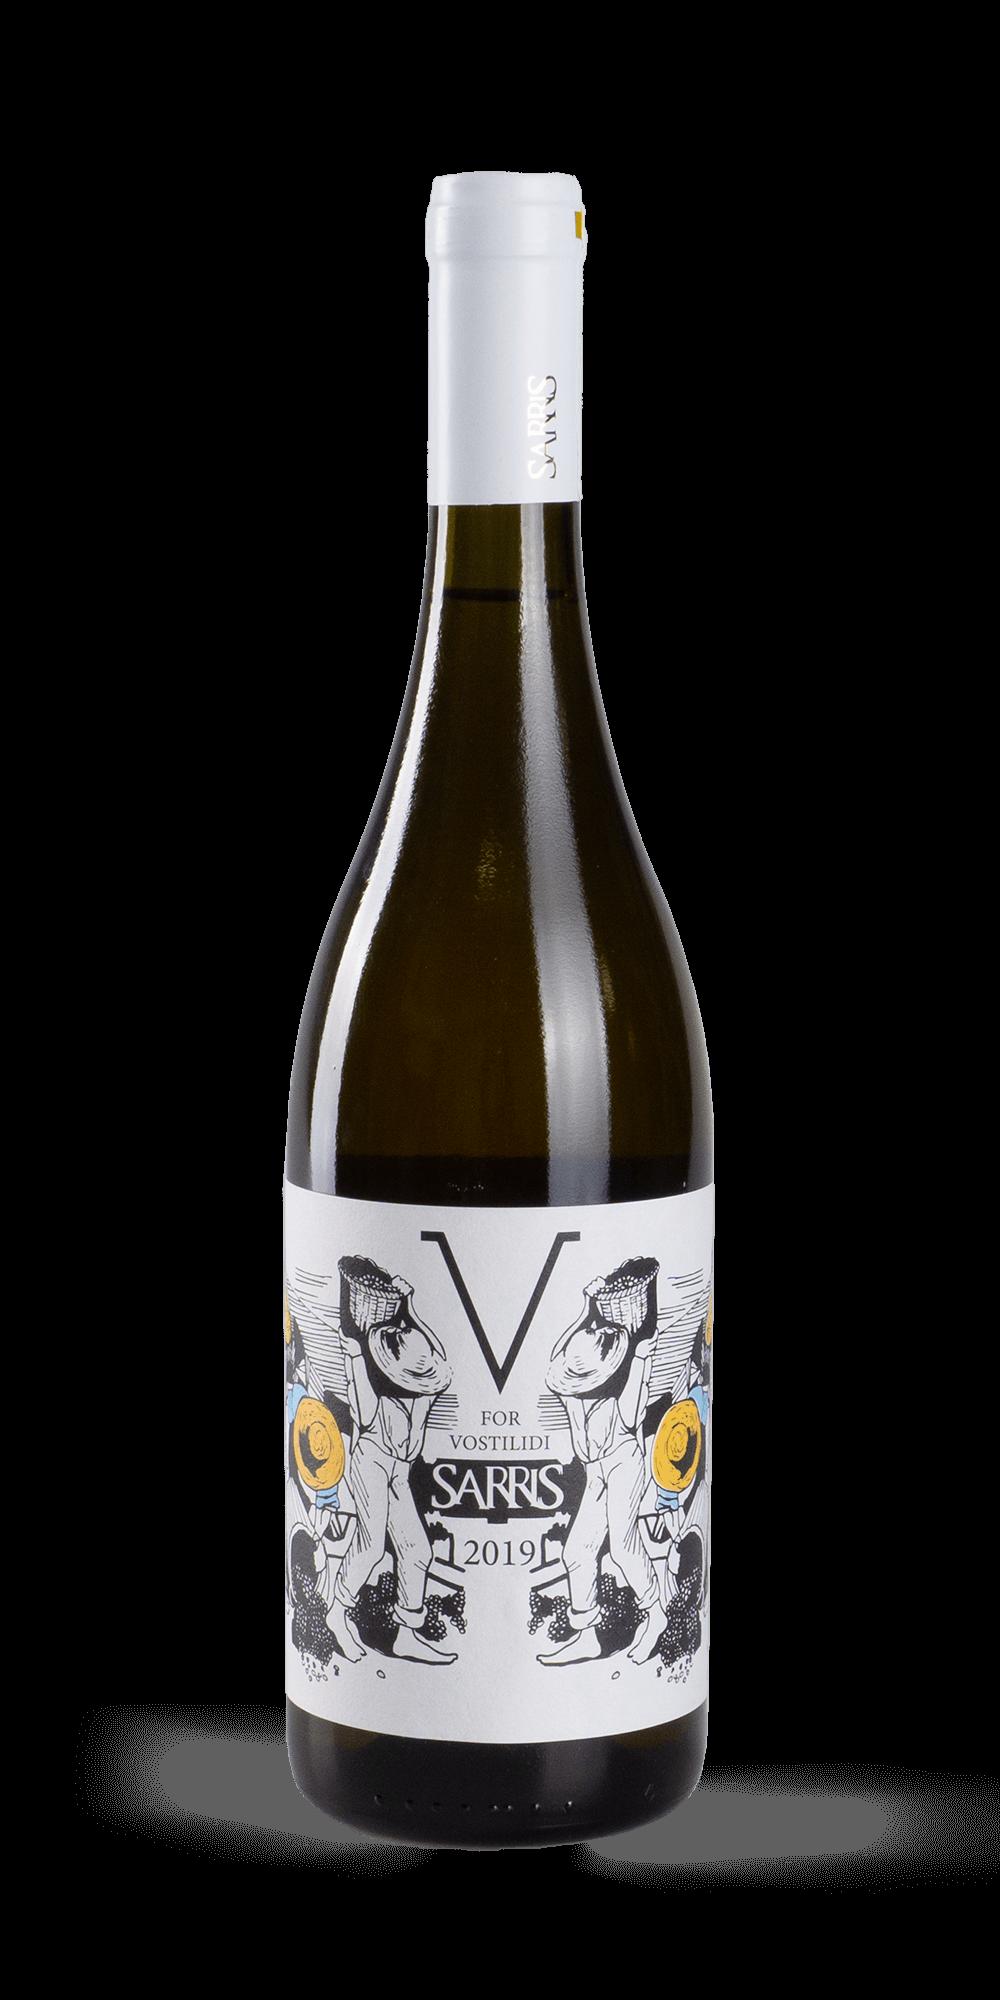 V for Vostilidi 2019